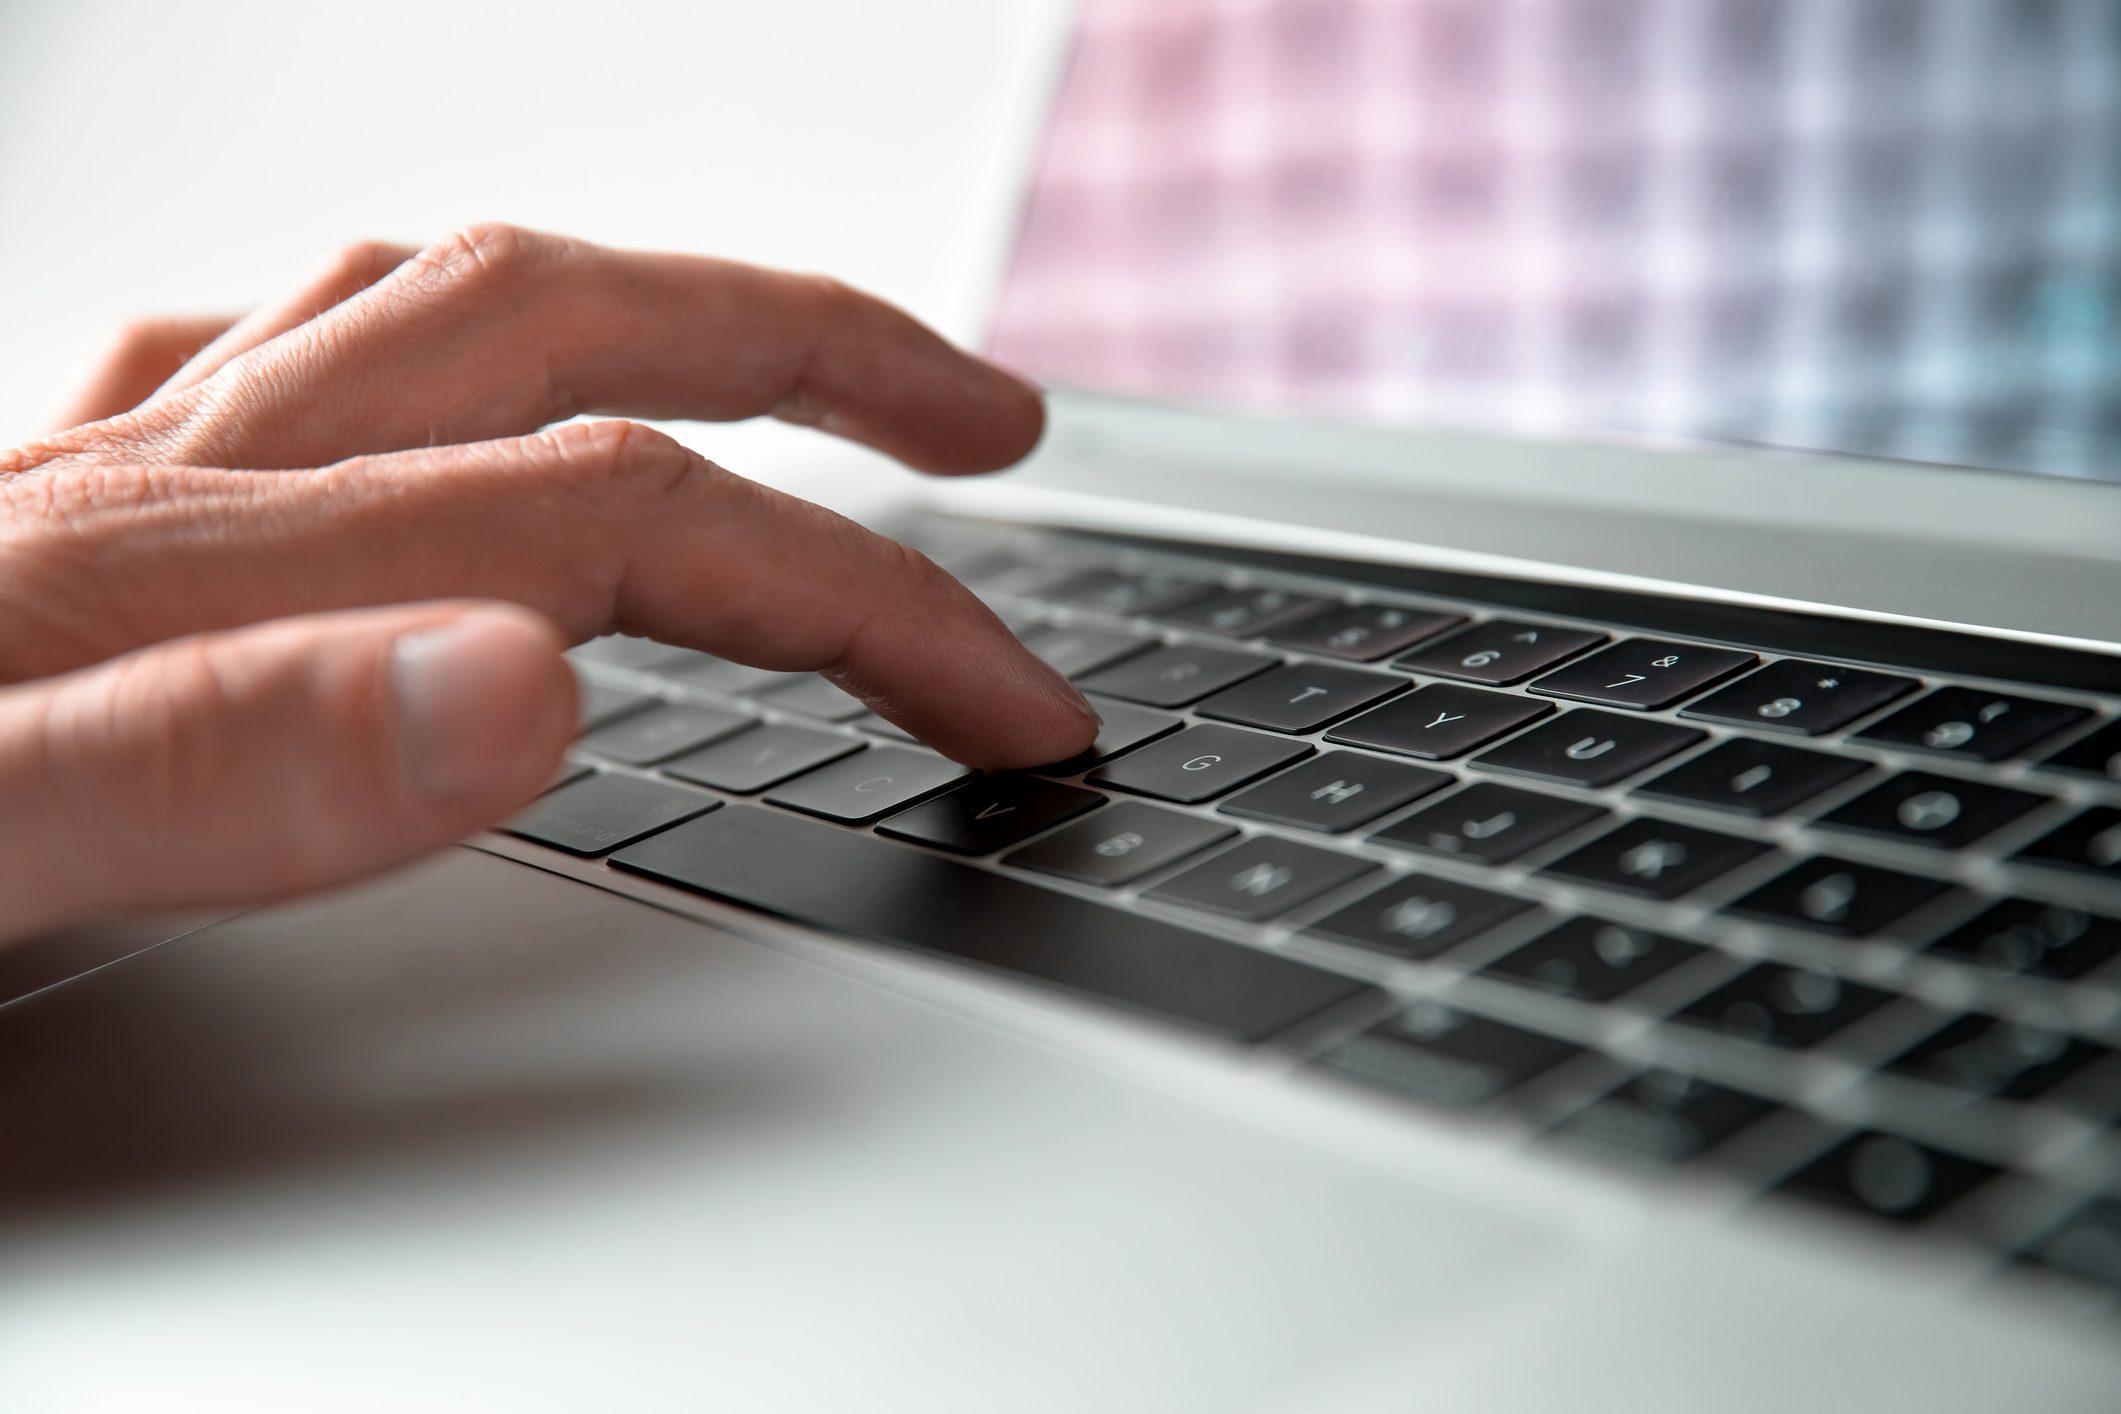 close up. man using a keyboard shortcut on a laptop keyboard